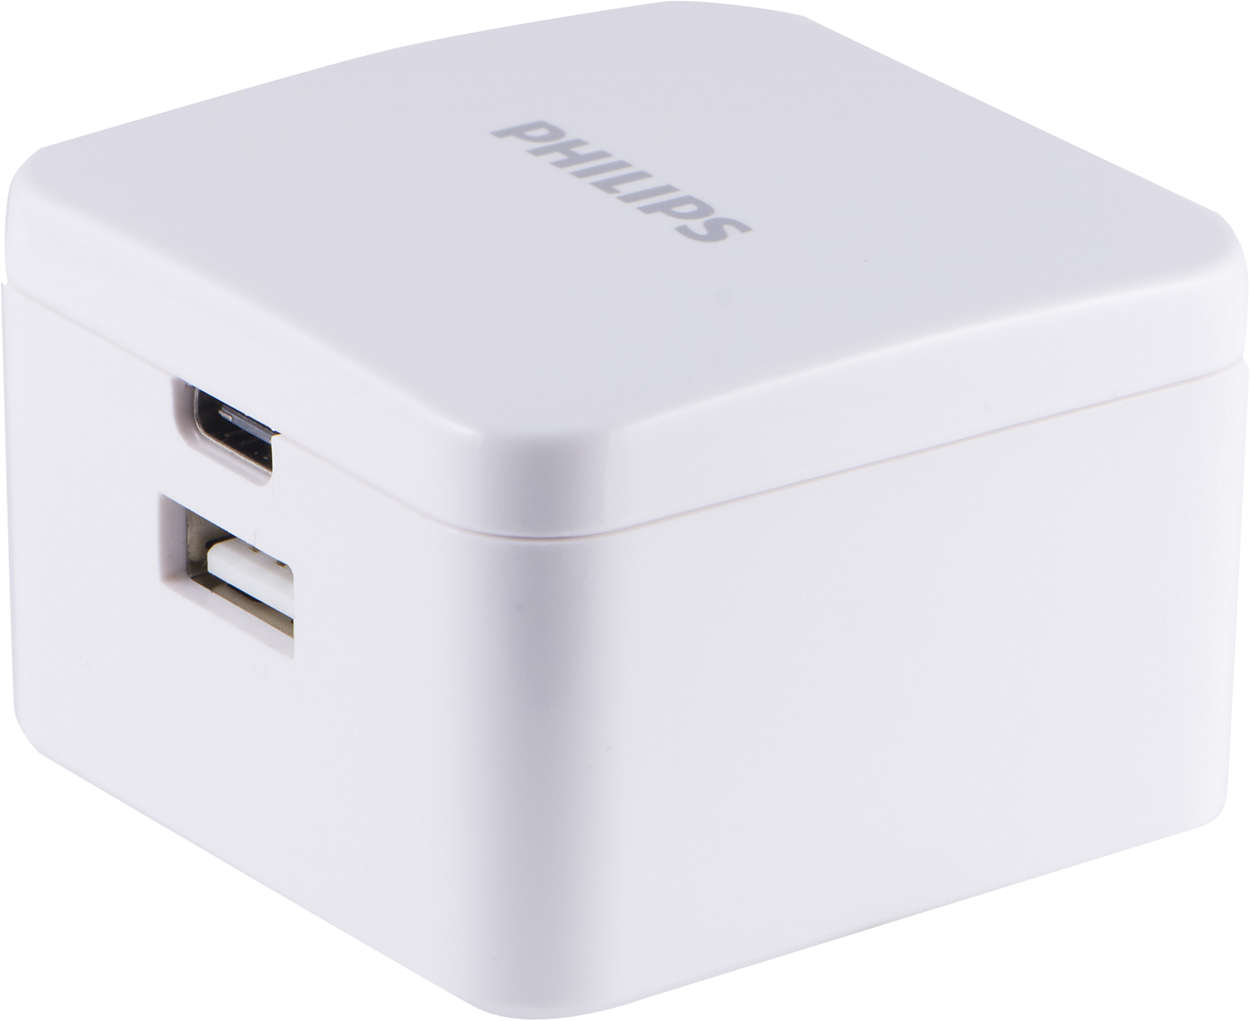 Versatile USB Charging Solution